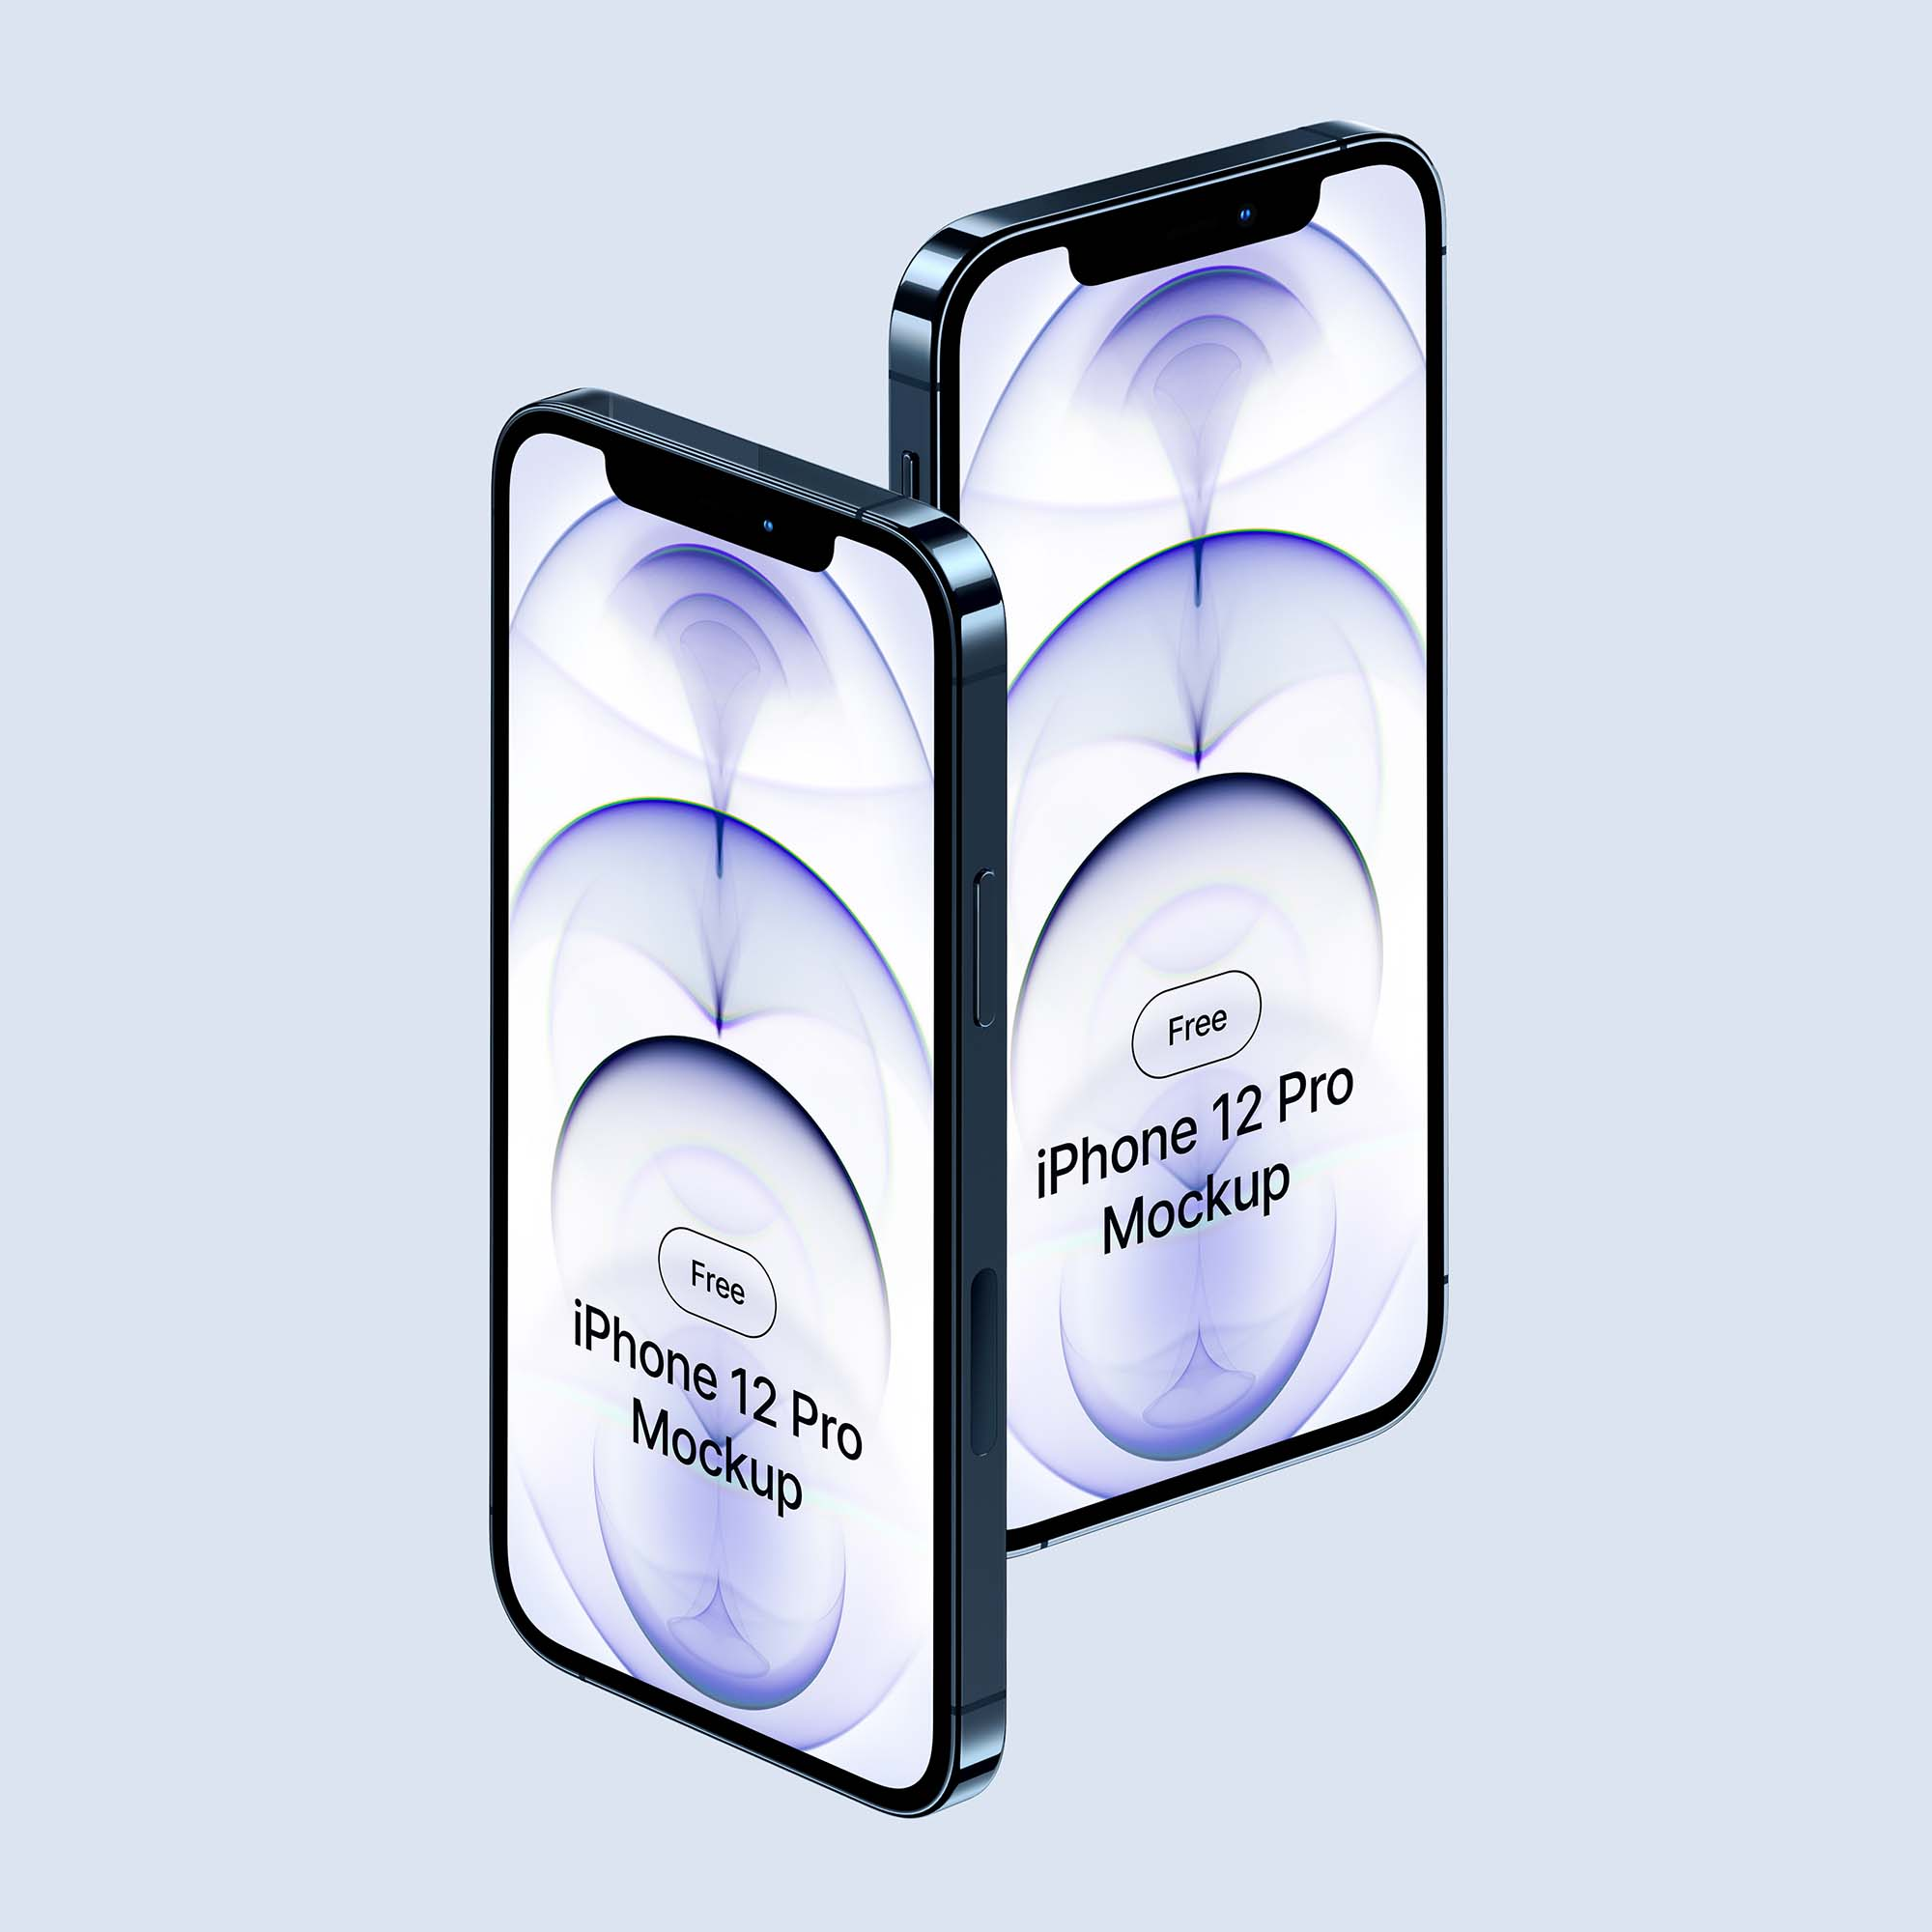 iPhone 12 Pro Mockup 4